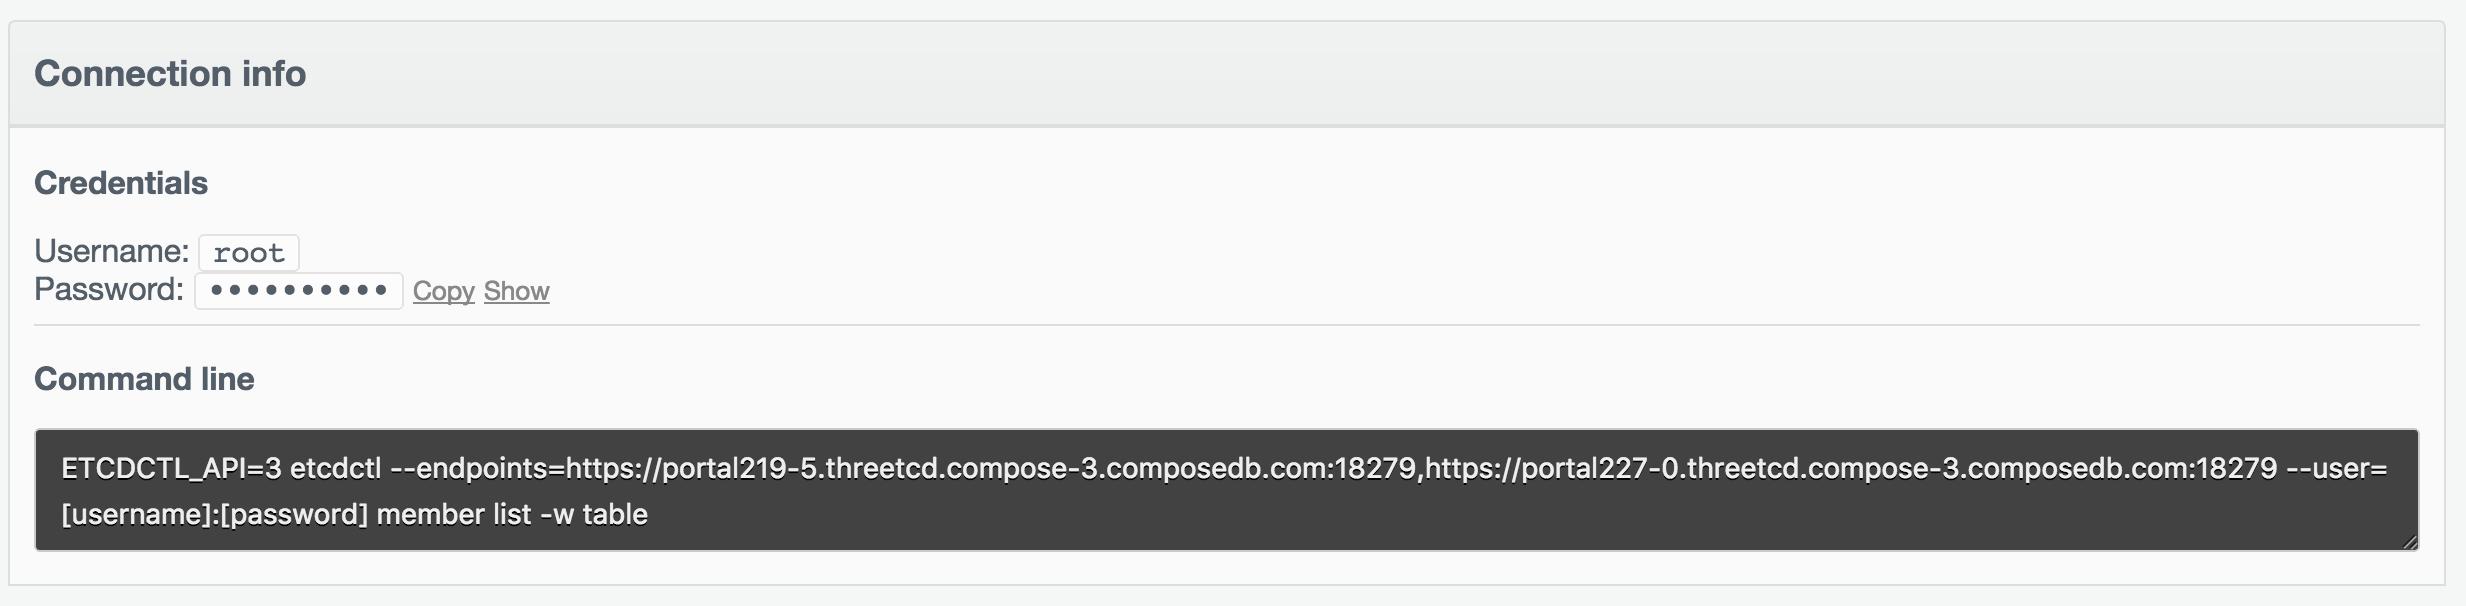 etcd v3 connection info